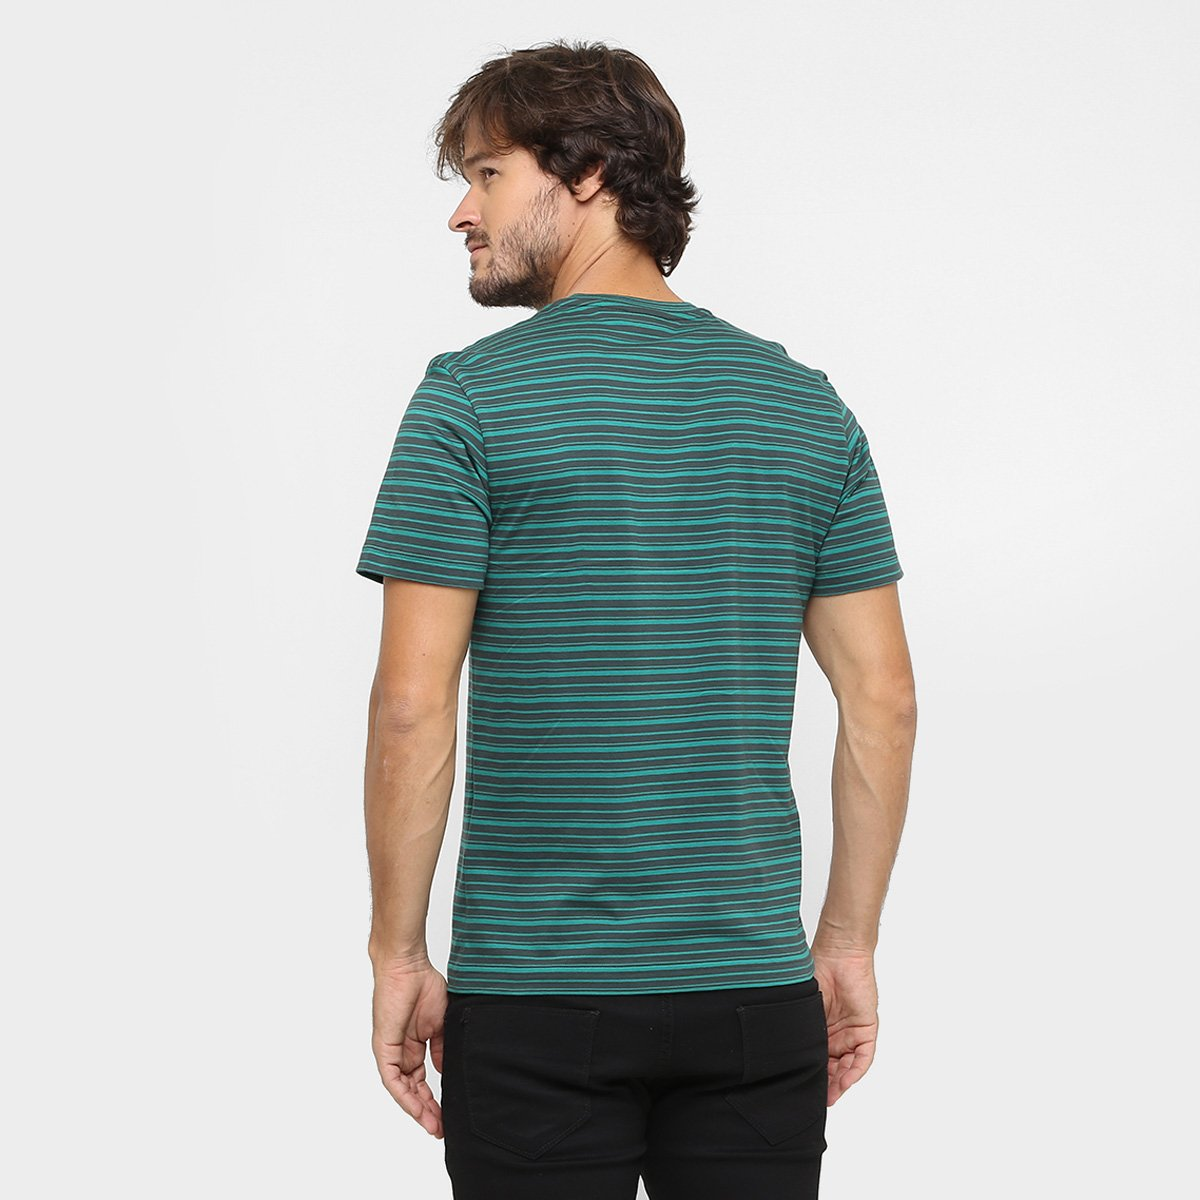 Camiseta Lacoste Gola V Listrada - Compre Agora   Netshoes dd7256bf0d